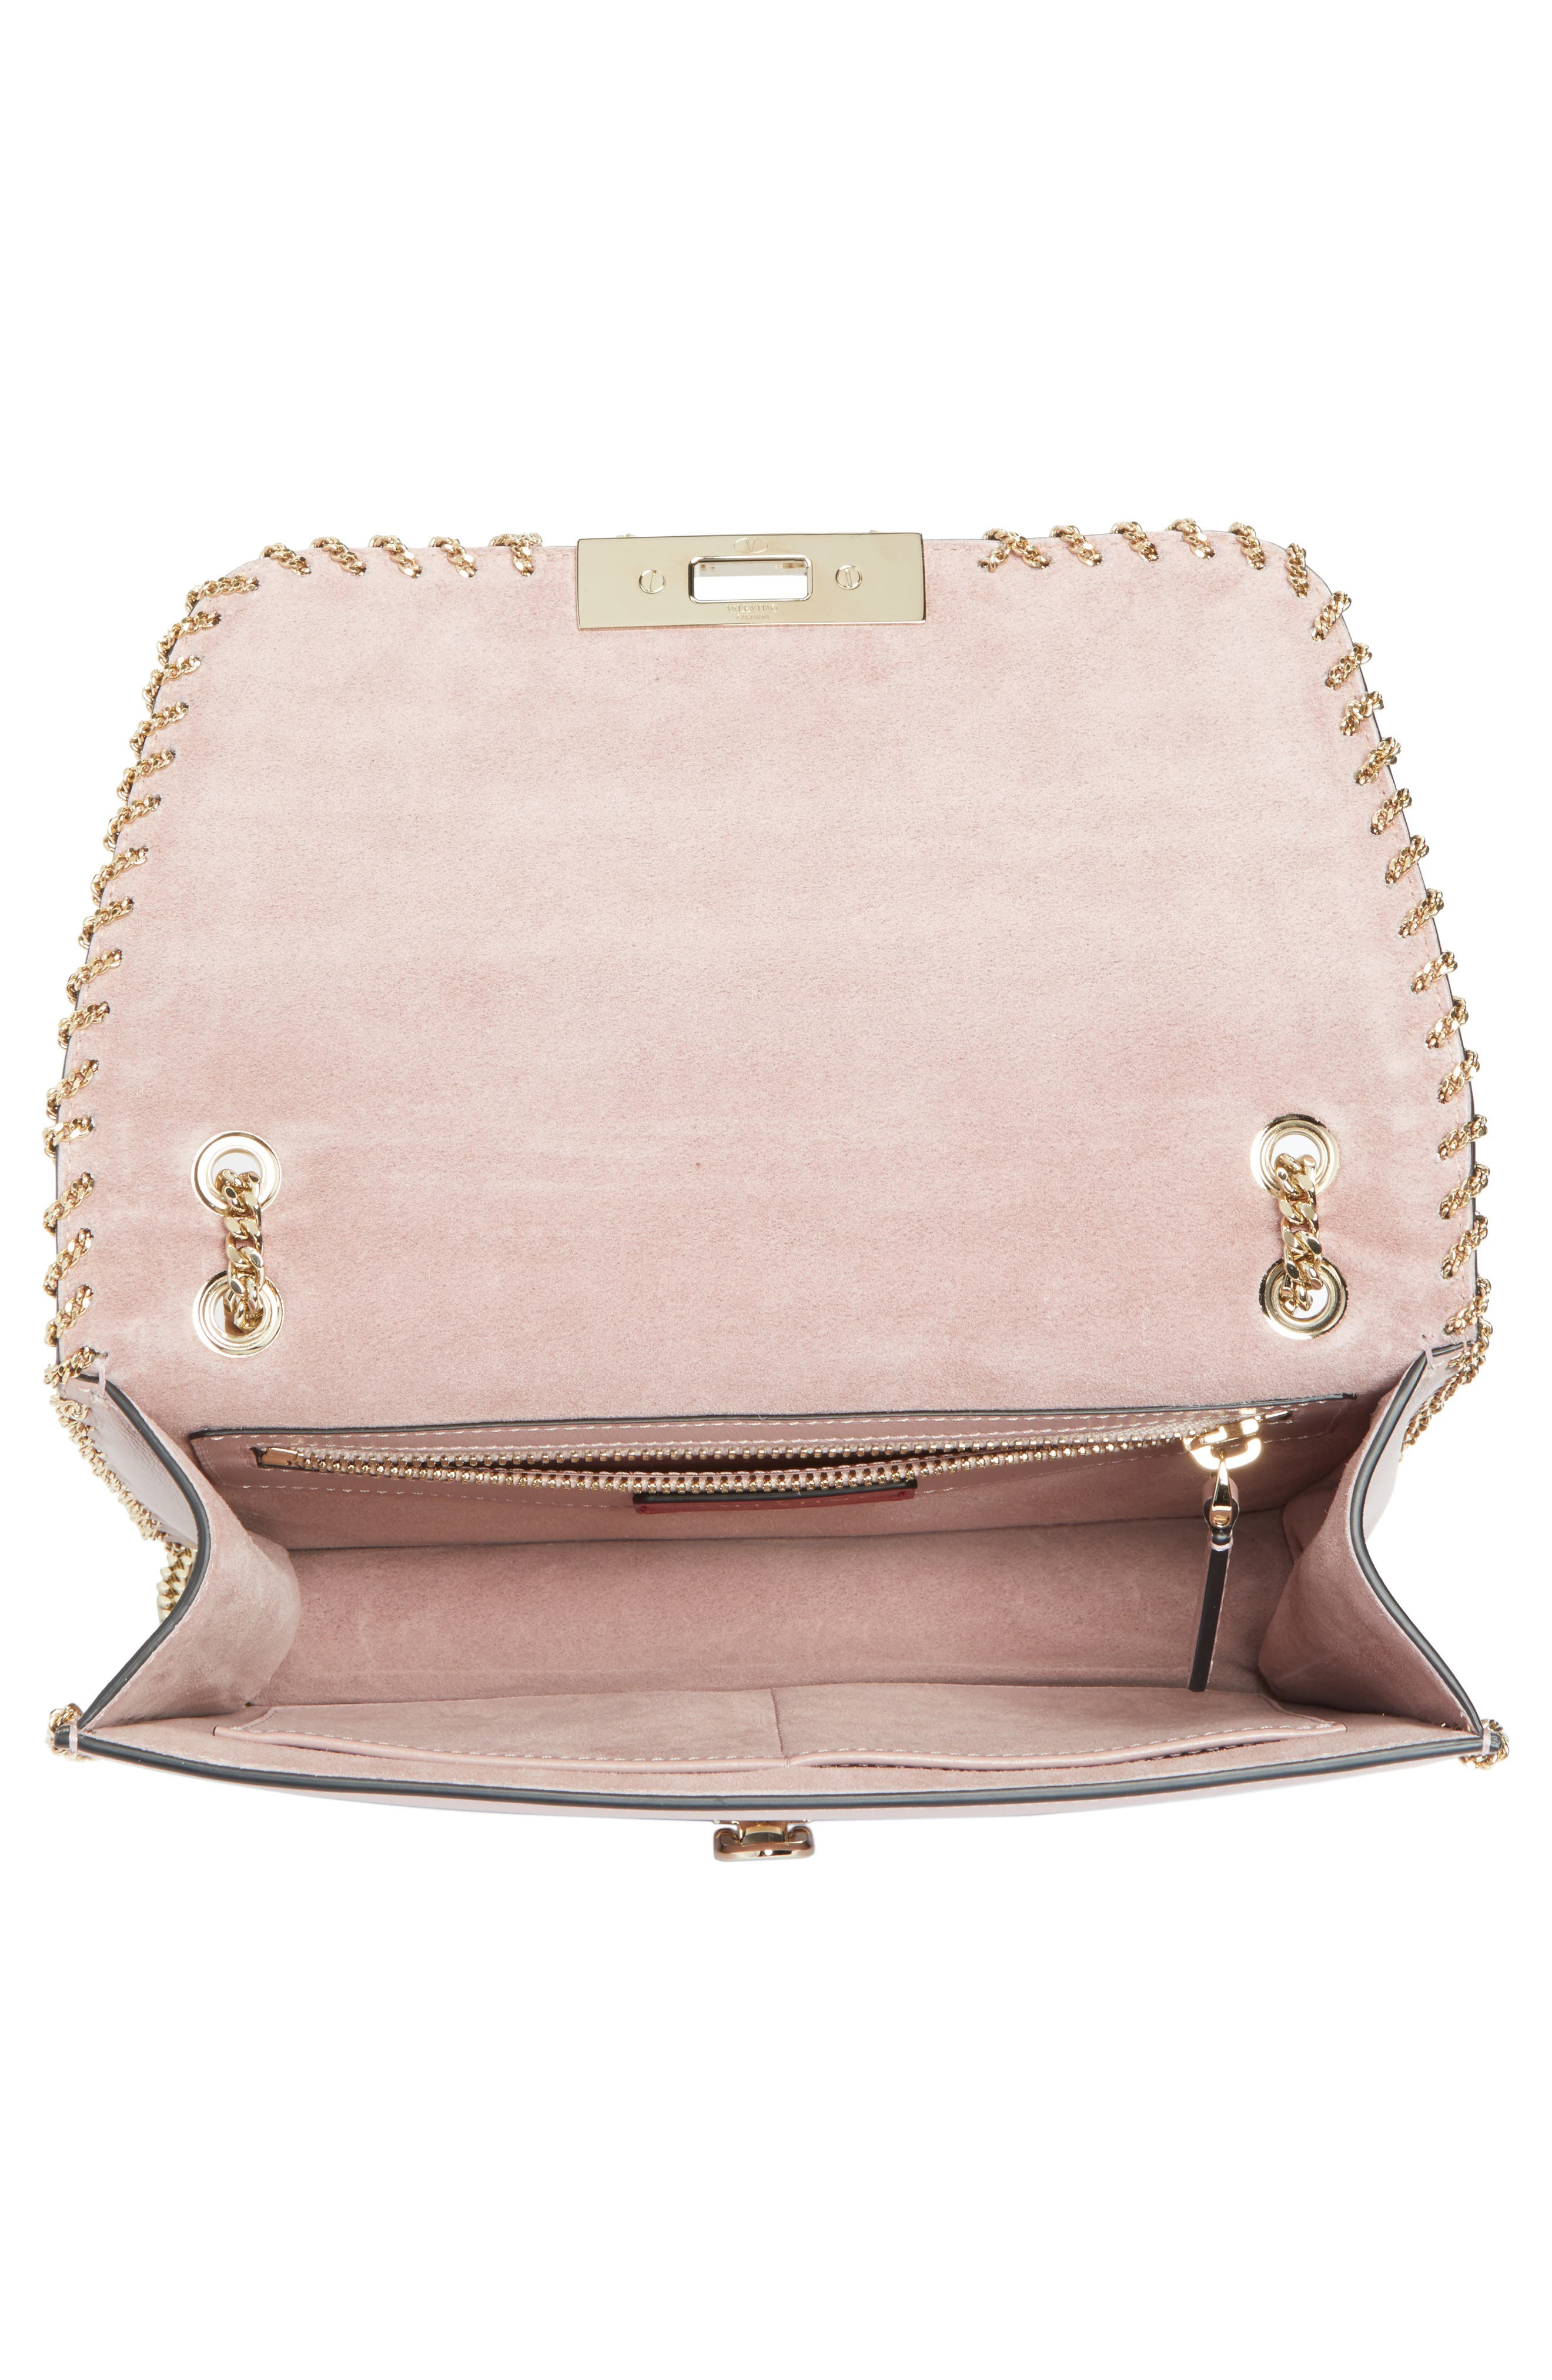 Demilune Whipstitch Leather Shoulder Bag,                             Alternate thumbnail 2, color,                             Lipstick